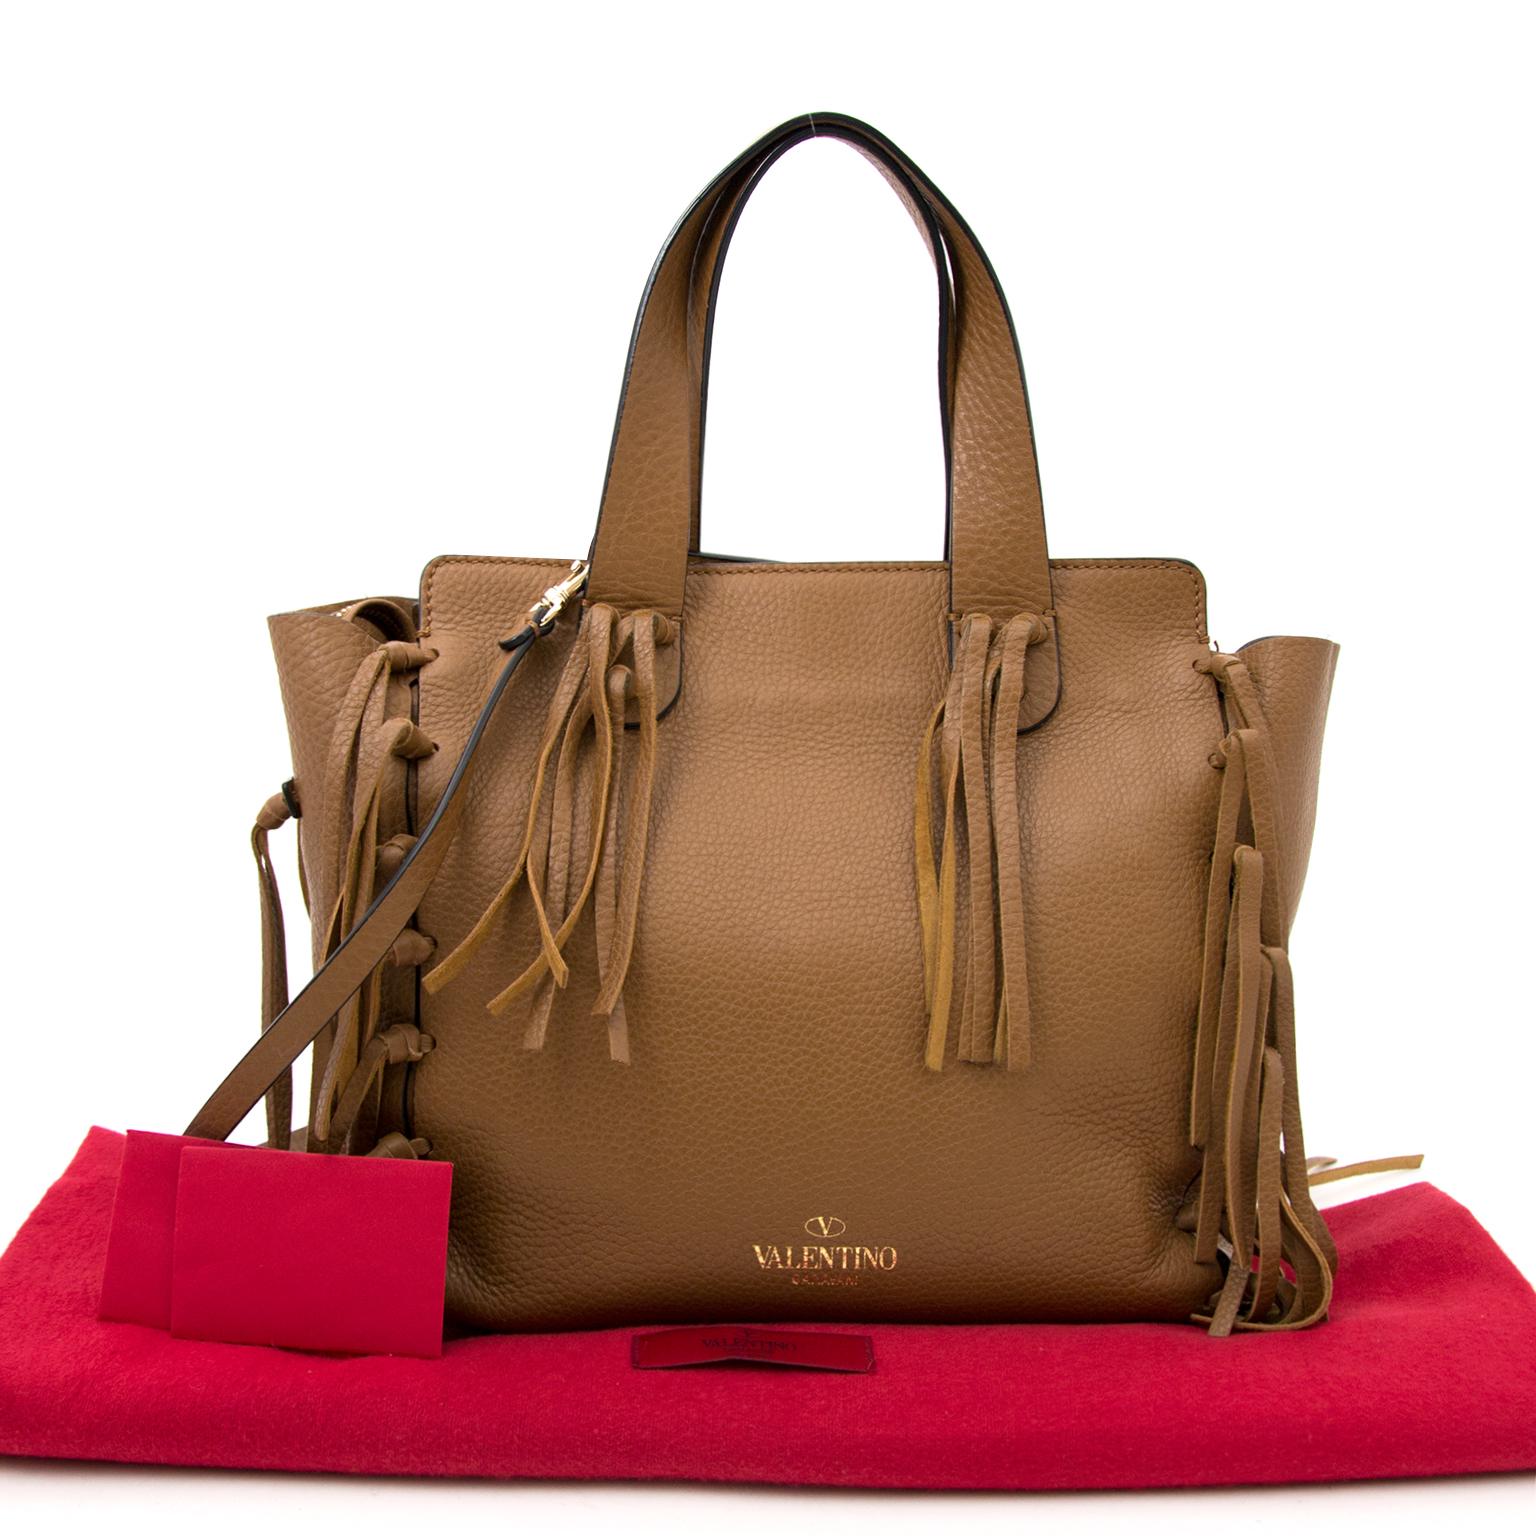 faf5200ebf9f7 Labellov Buy authentic vintagePrada designer bags, shoes, clothes ...